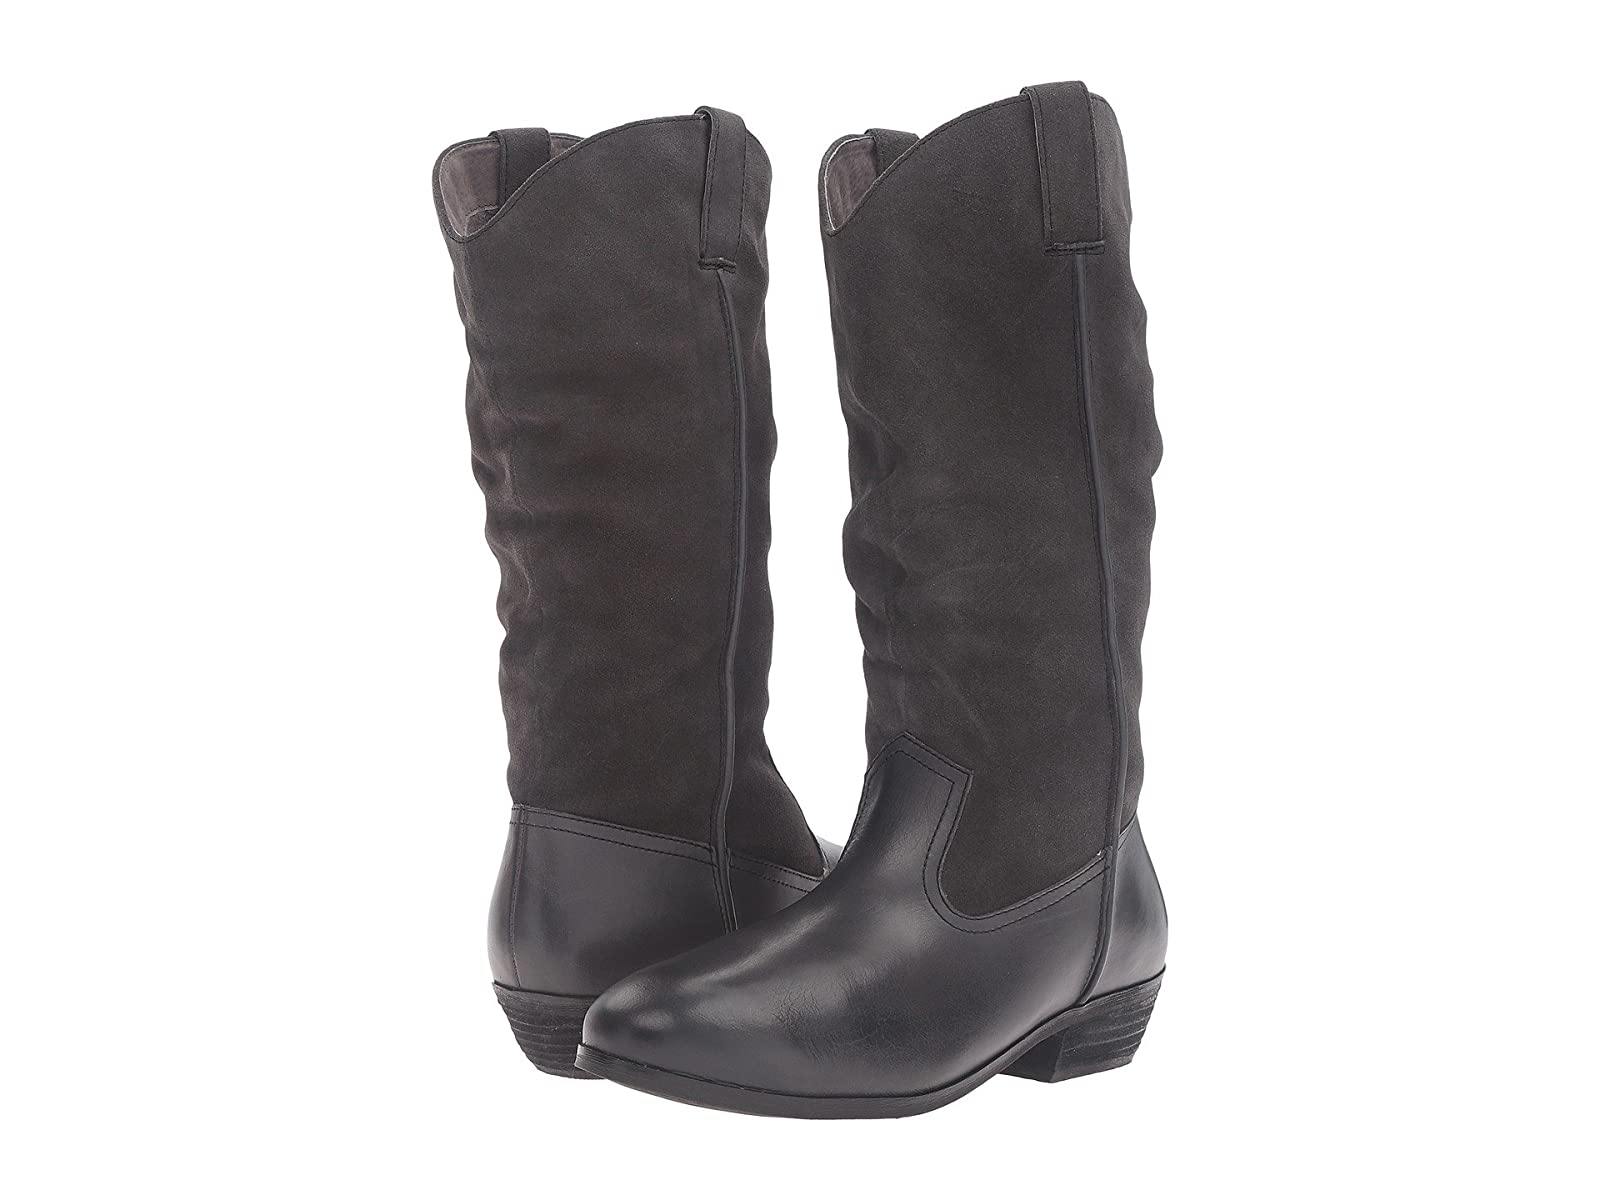 SoftWalk Rock CreekCheap and distinctive eye-catching shoes